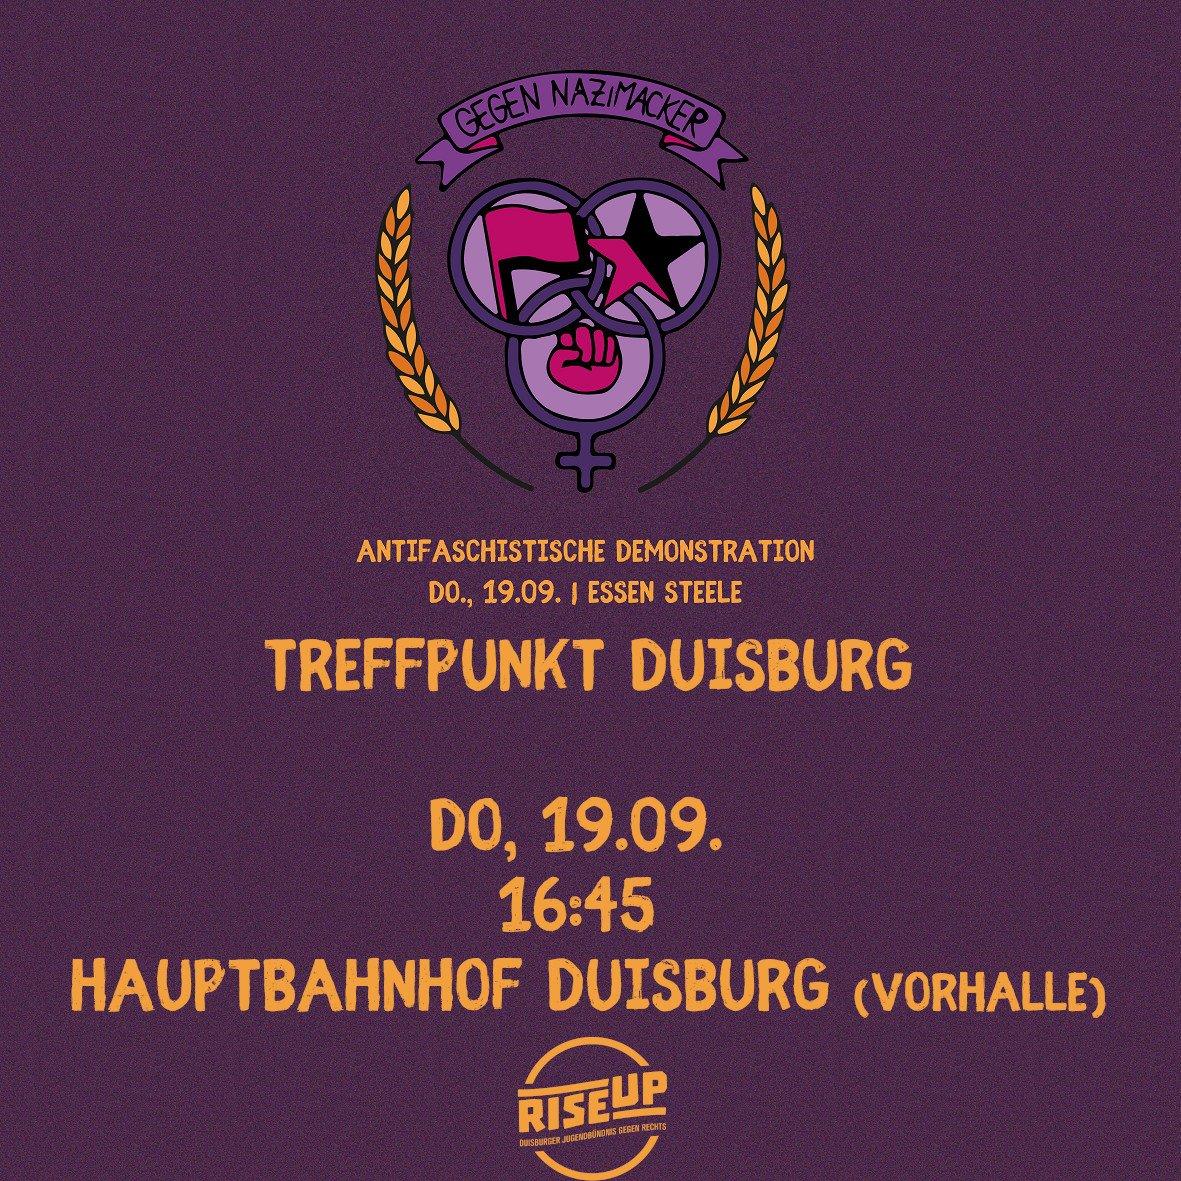 RT @riseupduisburg: #e1909 #essen1909 #GegenNazimacker https://t.co/bKjHl8BWSA